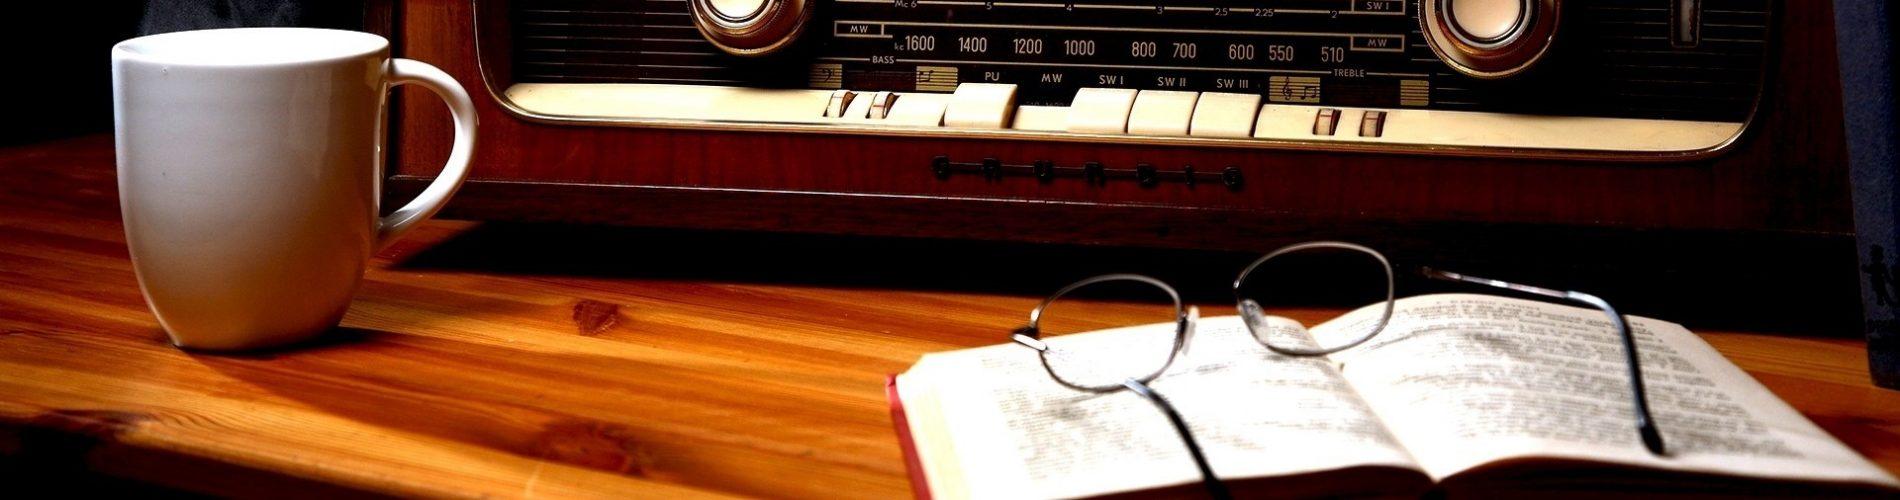 Cityradion.nu – Ett Diskussionsforum